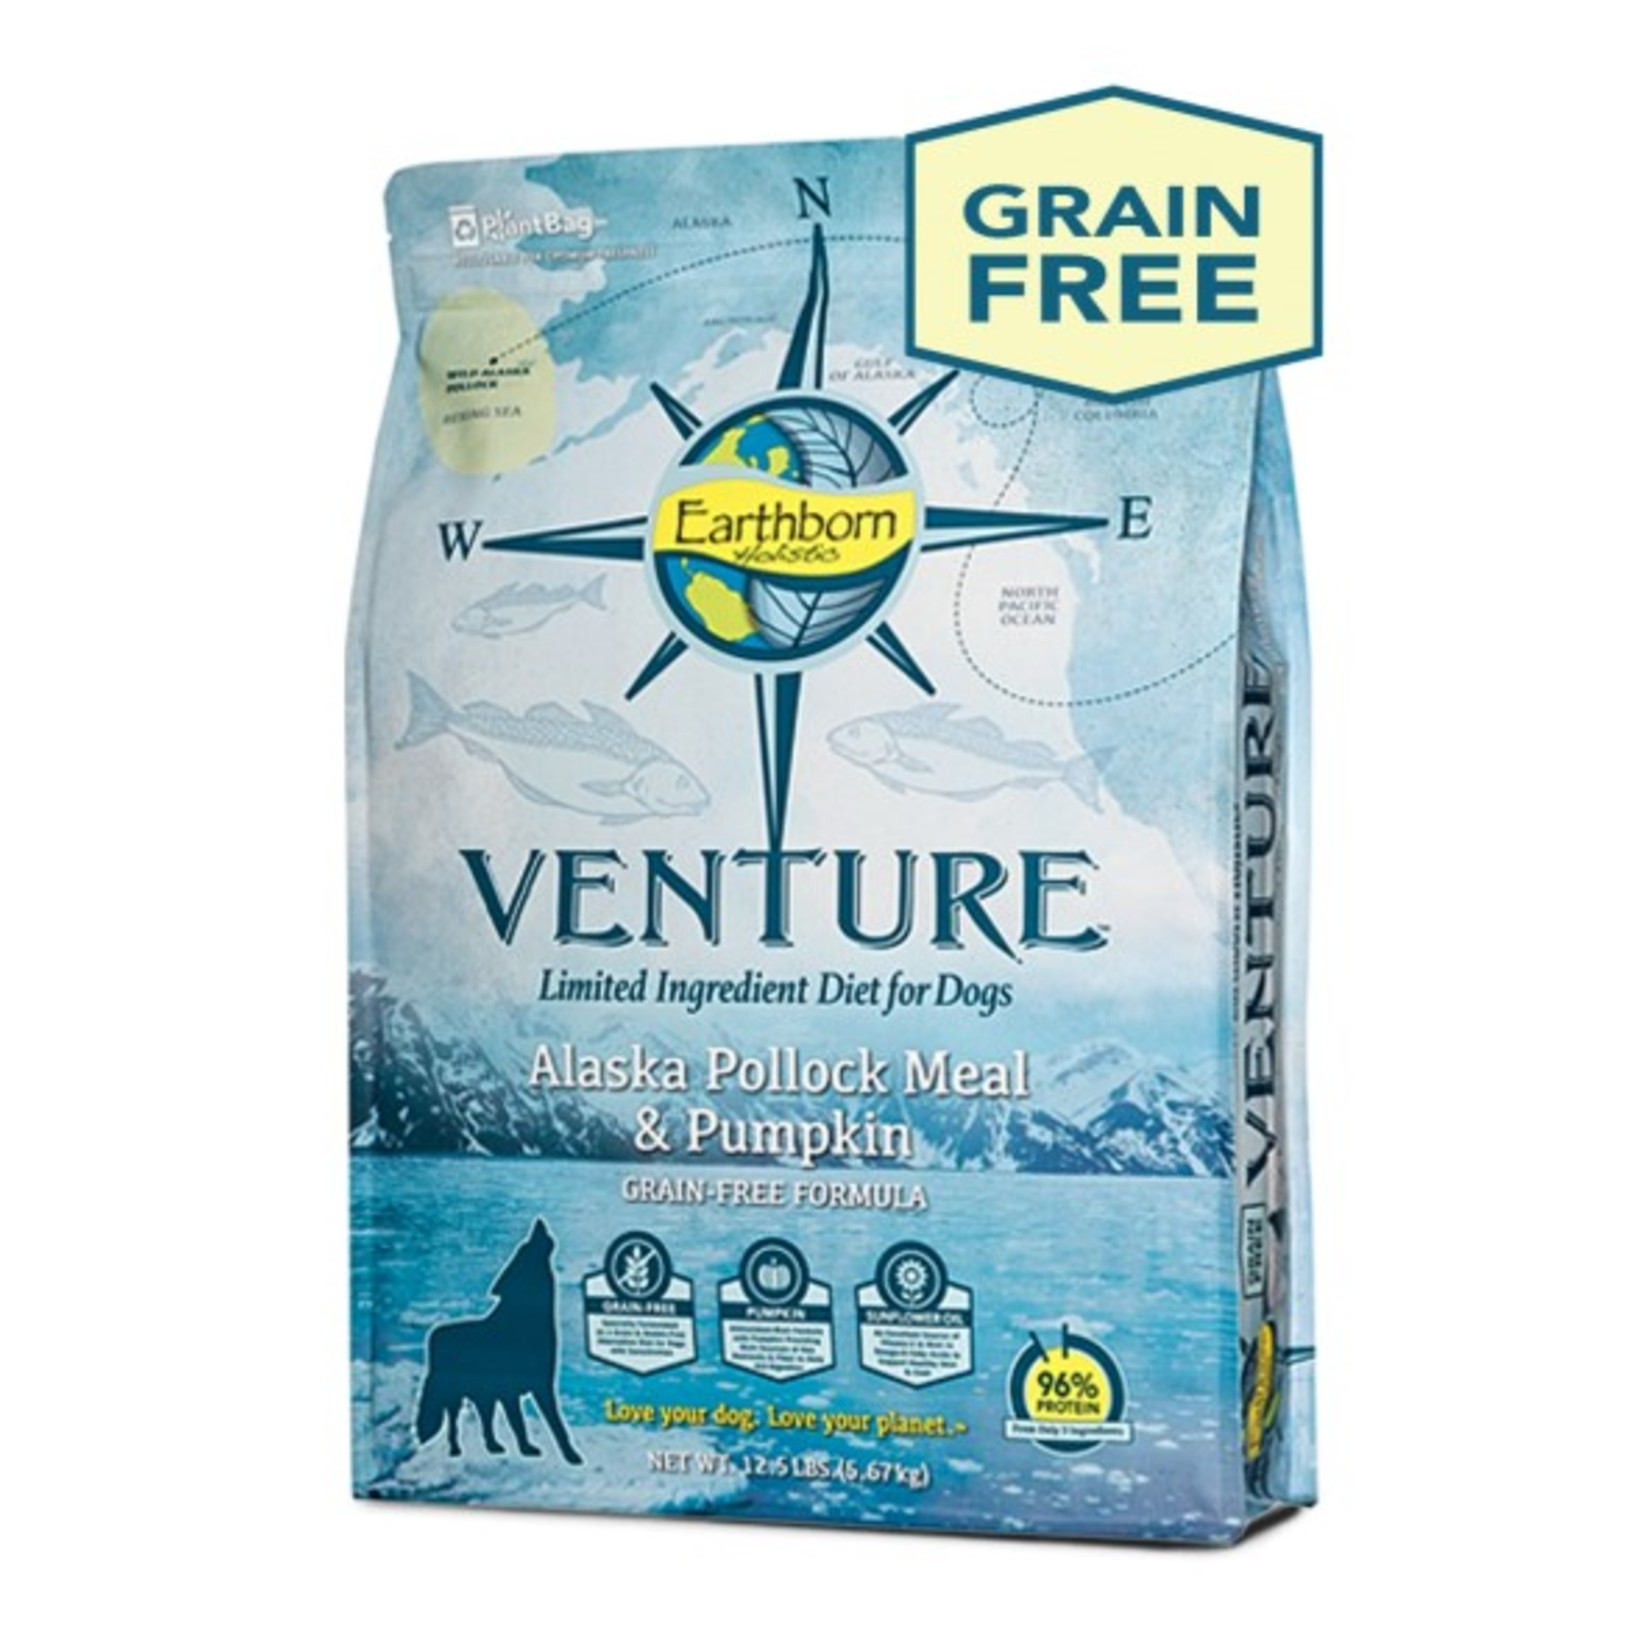 Venture Earthborn Venture GF Pollock Meal and Pumpkin Dog Food